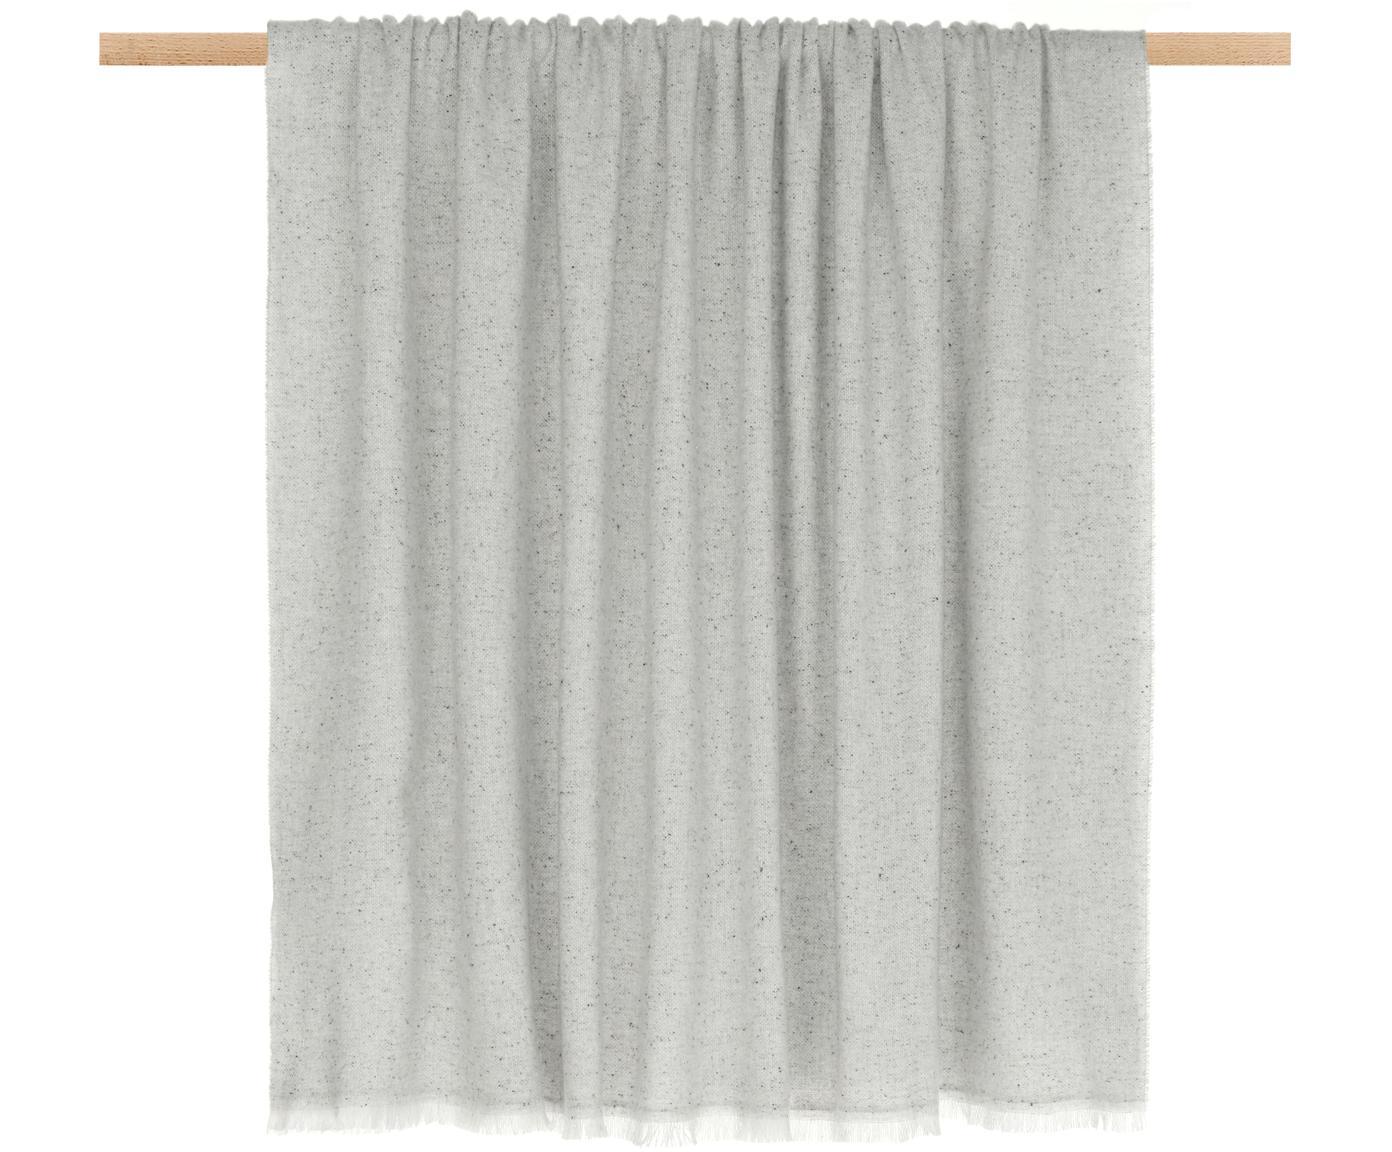 Grau meliertes Wollplaid Ionio, 48%Wolle, 25%Polyamid, 12%Viskose, 10%Seide, 5%Kaschmir, Grau, meliert, 130 x 170 cm